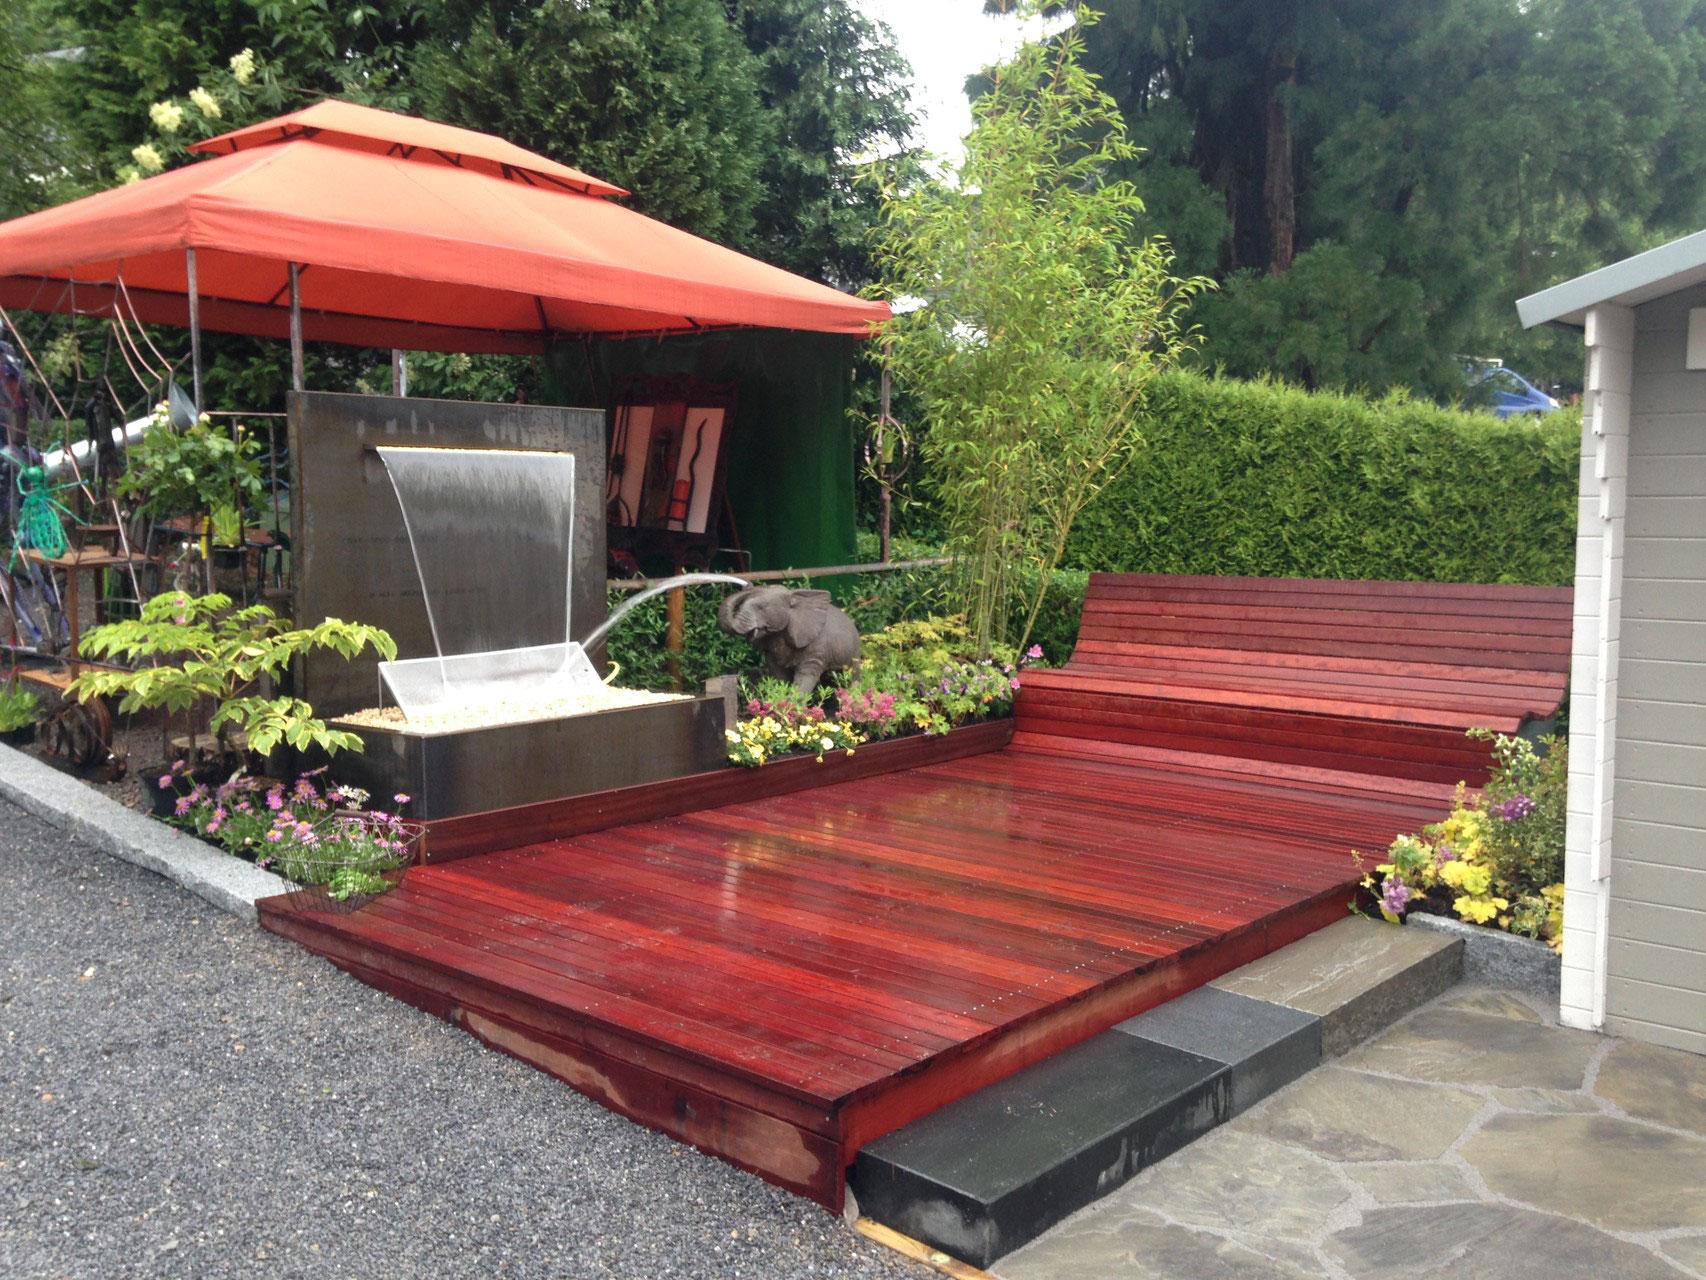 holz wuppertal garten und landschaftsbau wuppertal gelbrich. Black Bedroom Furniture Sets. Home Design Ideas